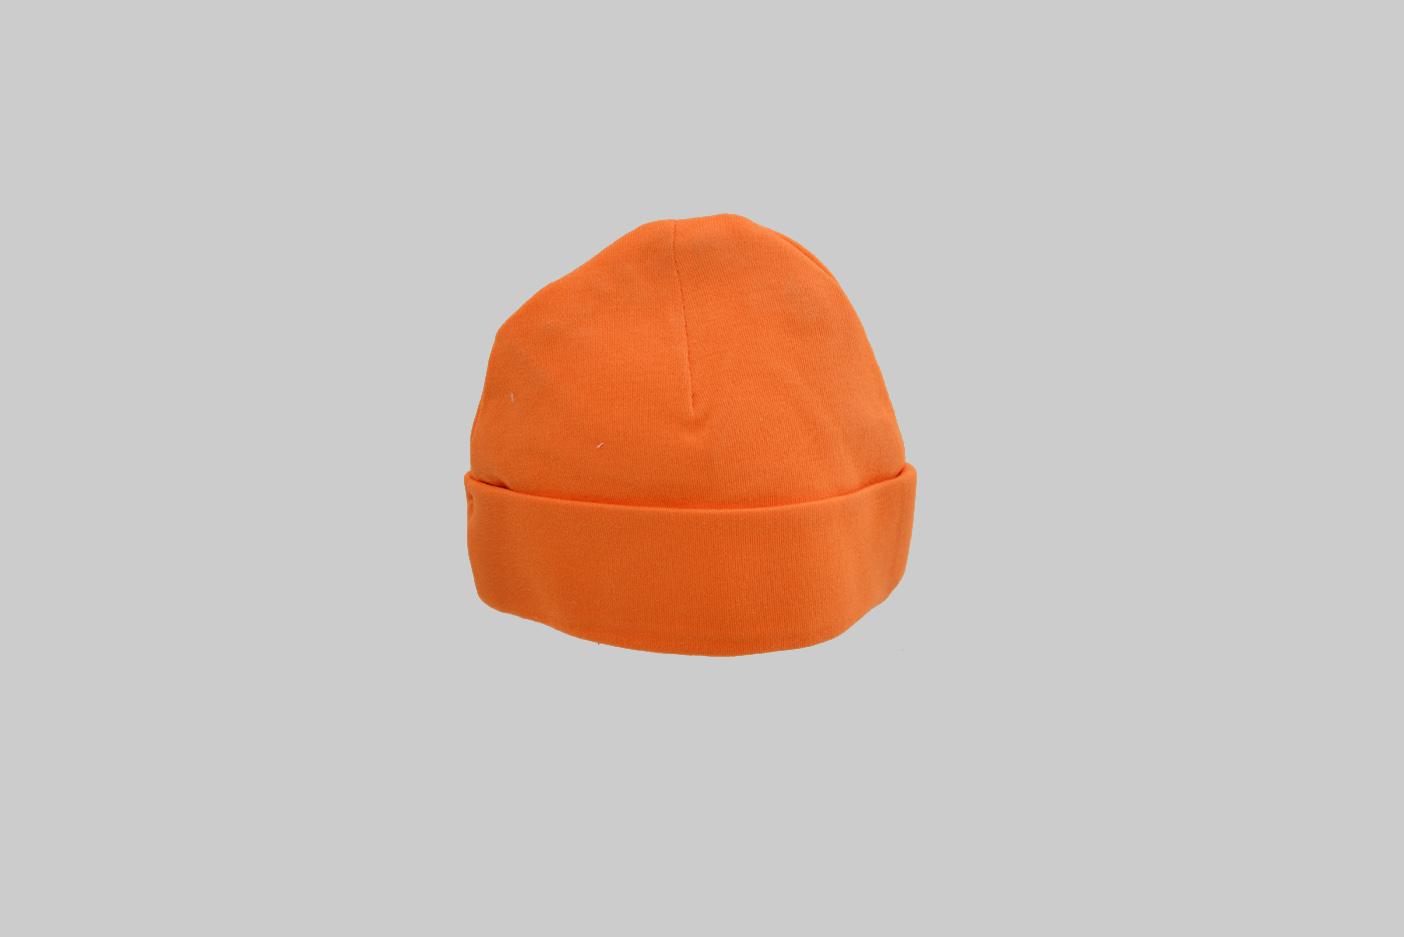 orange color baby cap